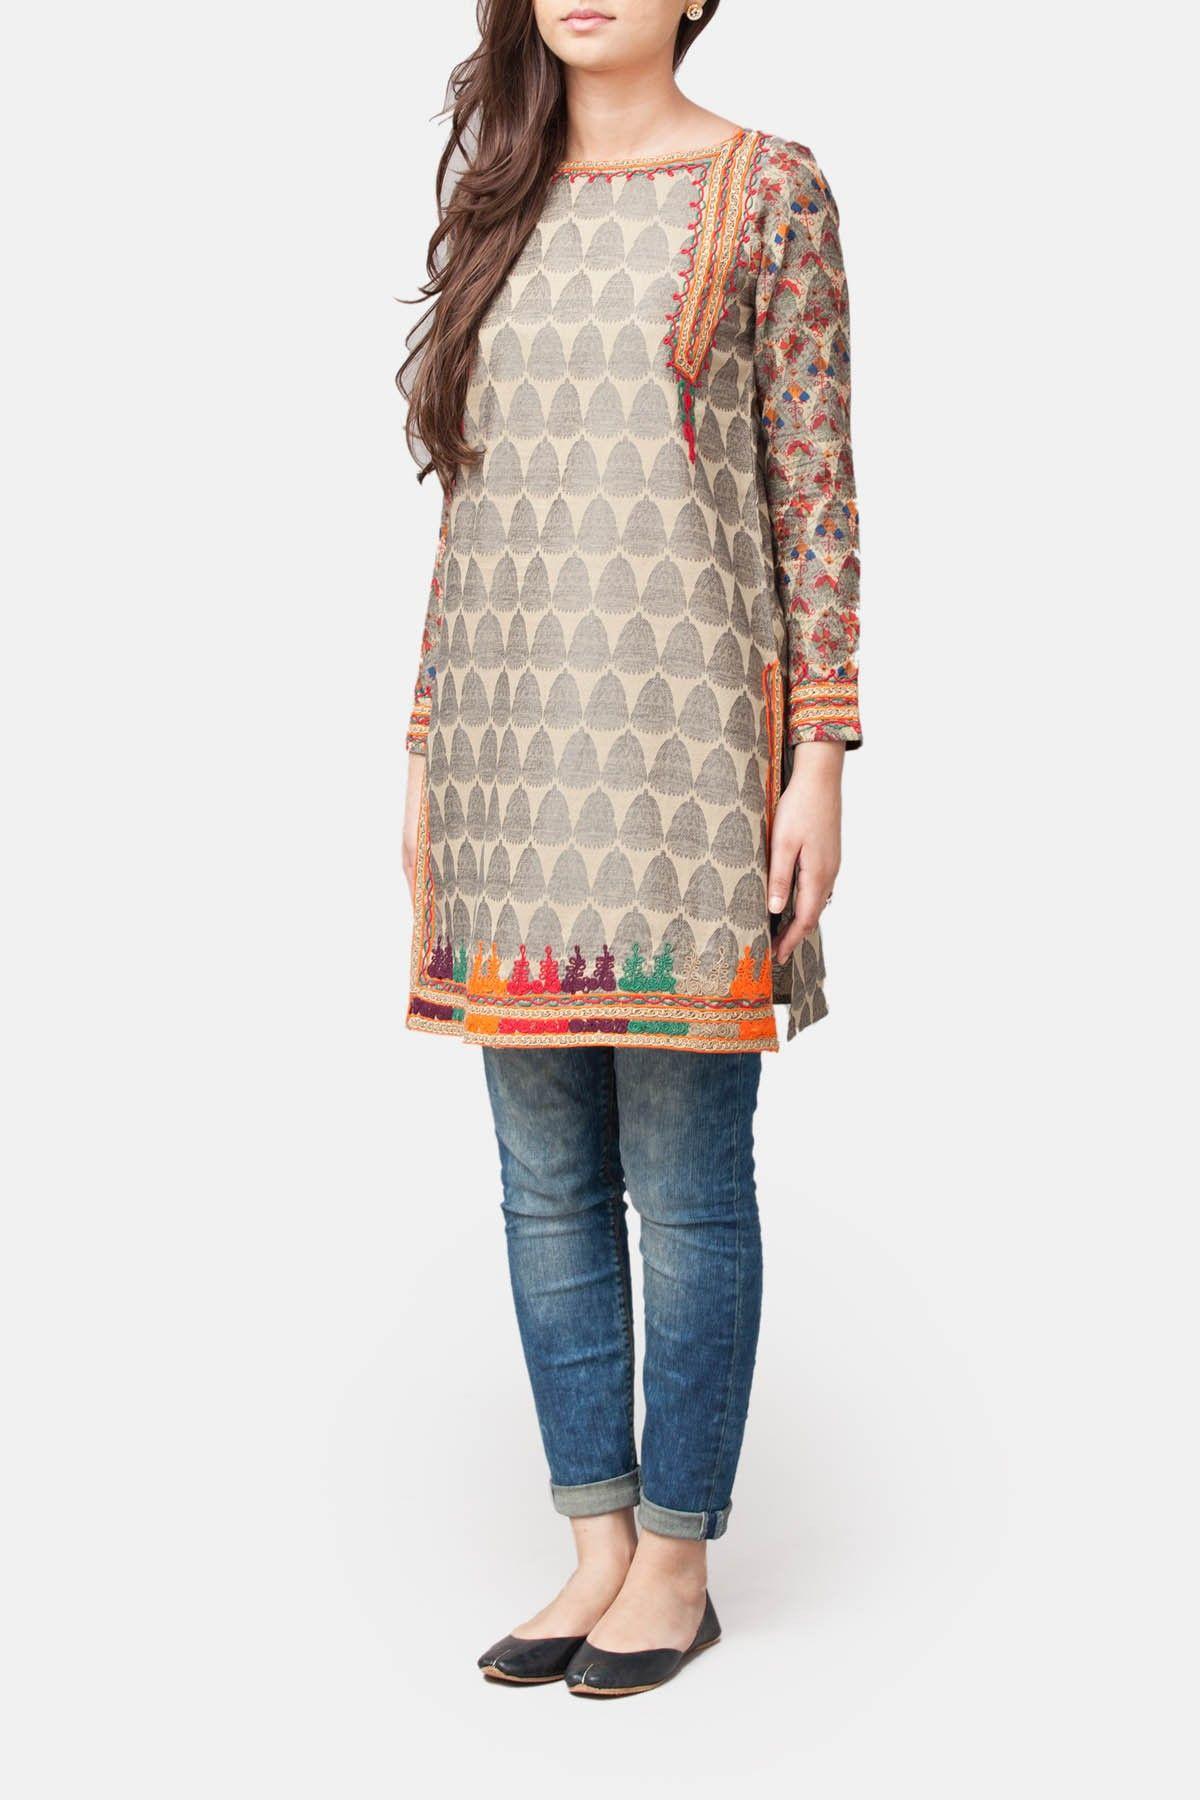 Central Asian Box Tunic - Generation | designer | Pinterest | Tunic ...